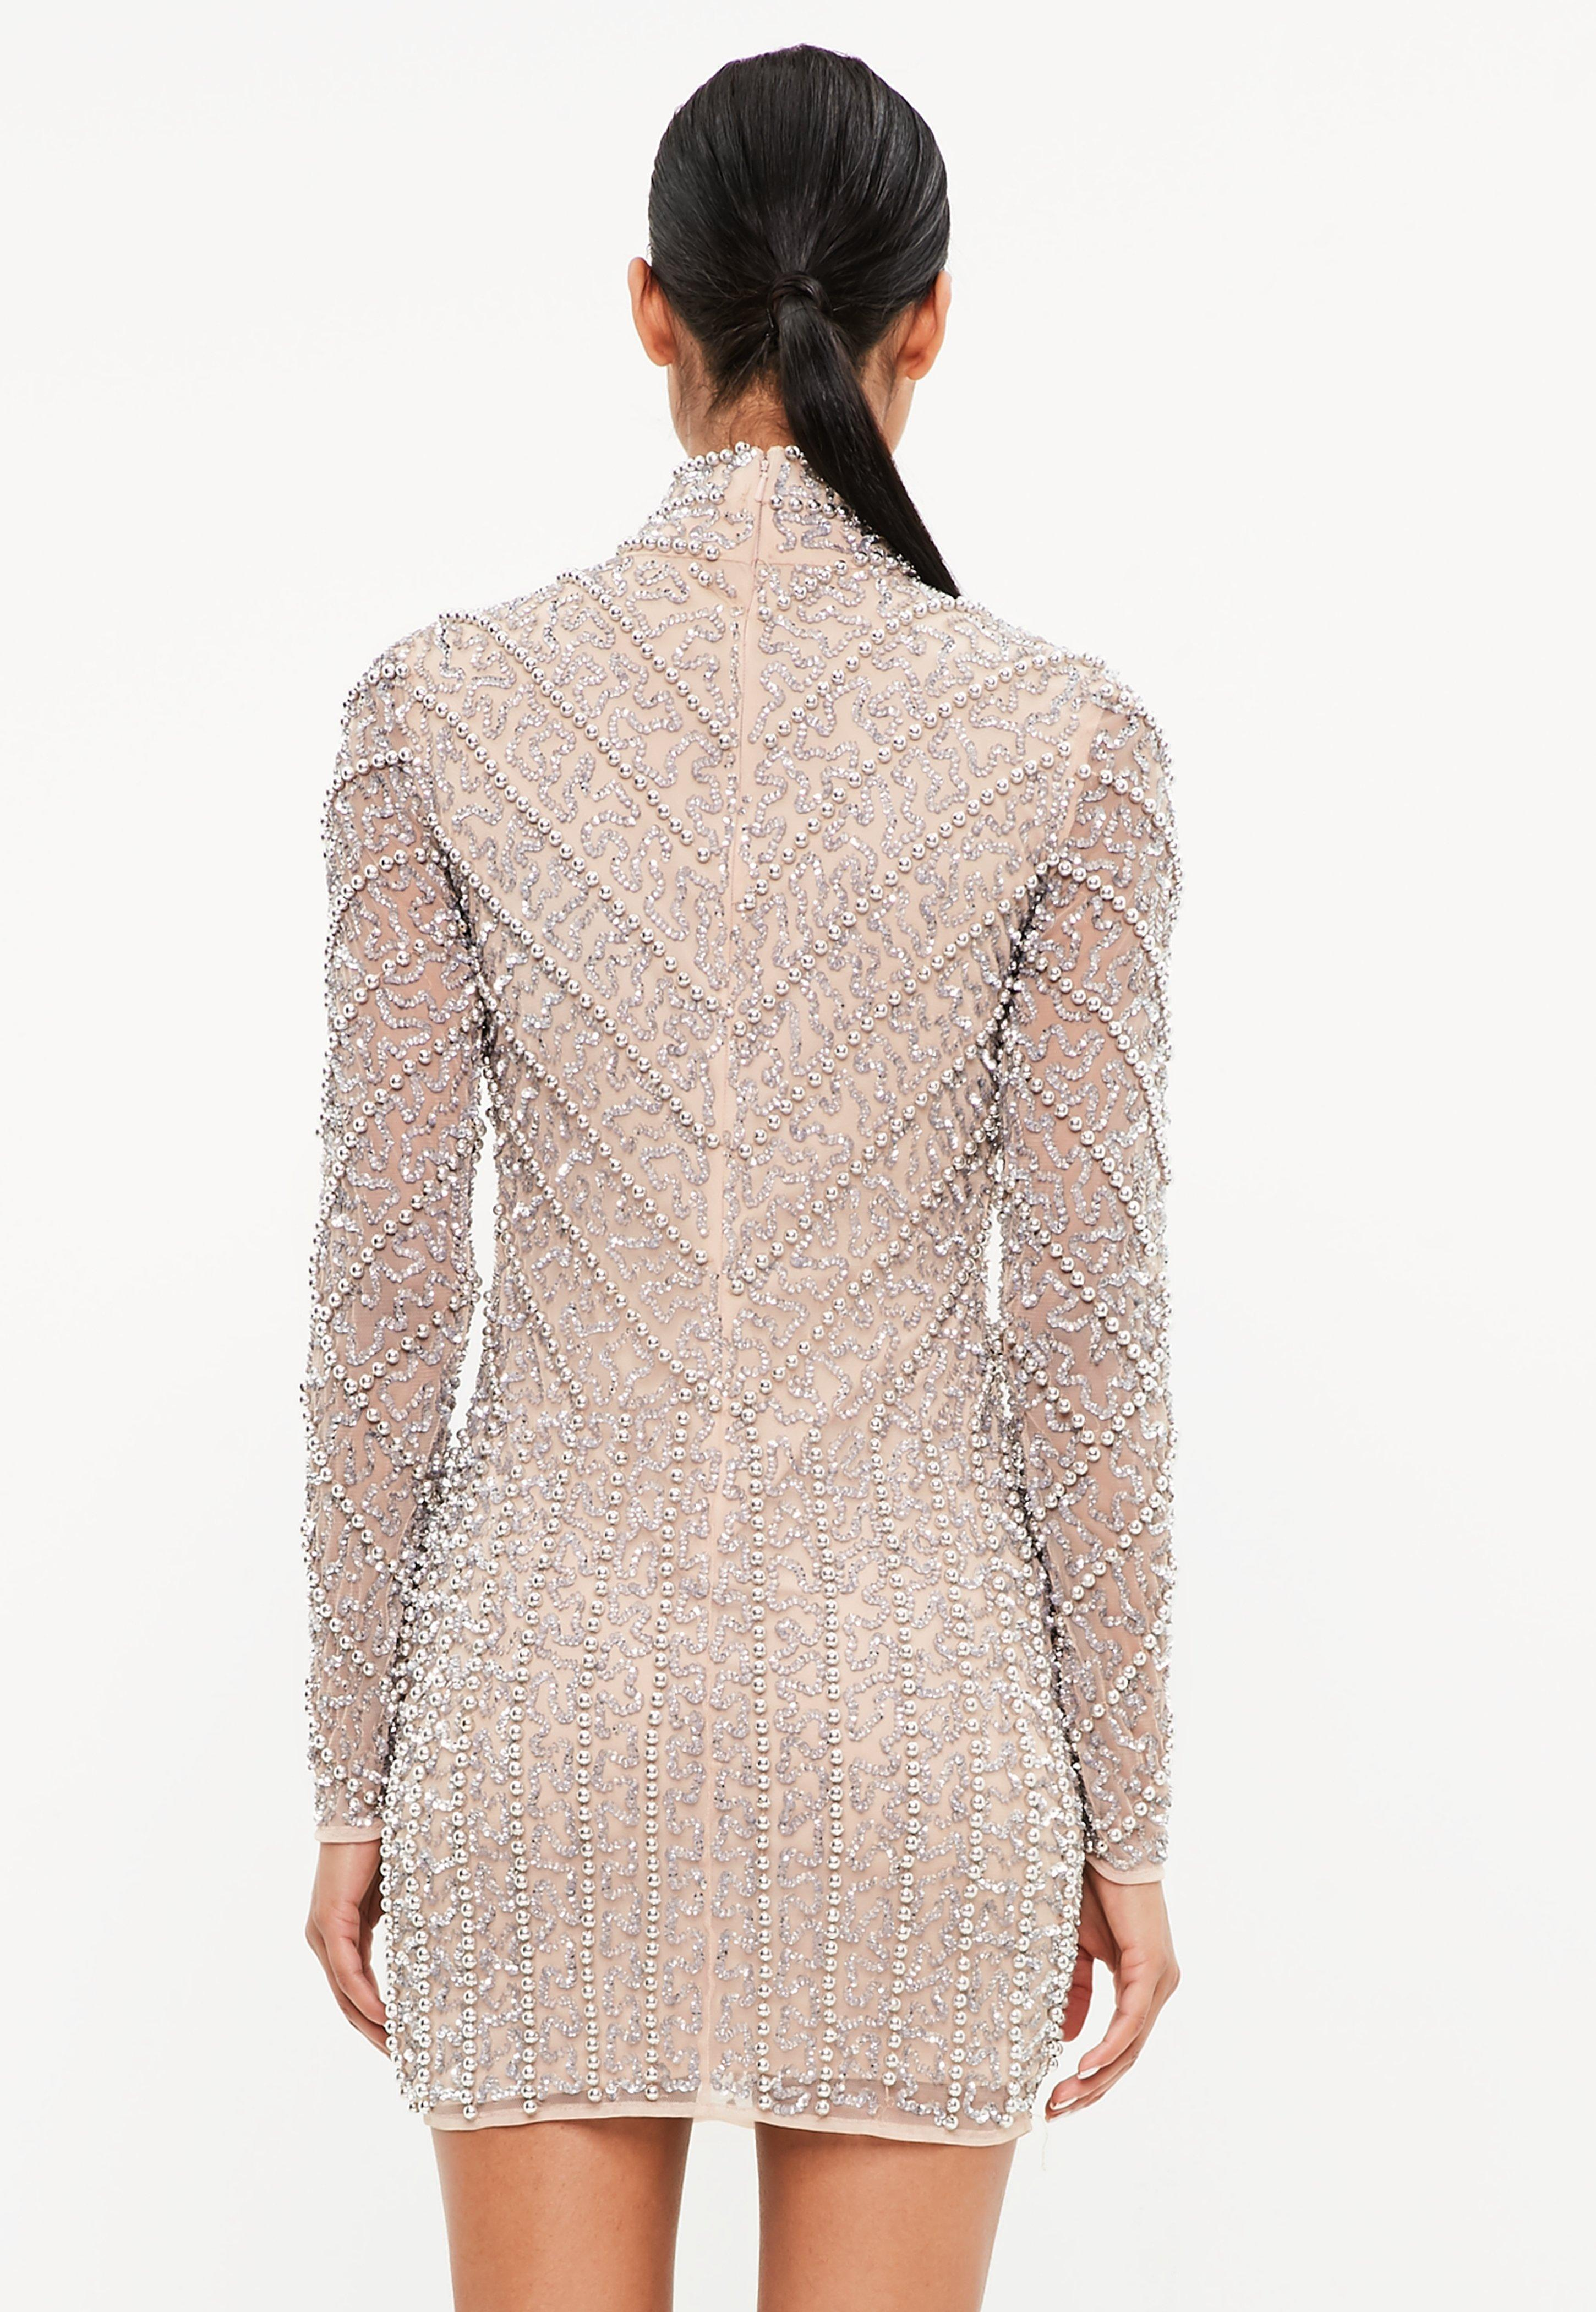 5eb04a115c Missguided - Metallic Peace + Love Silver High Neck Long Sleeve Beaded Mini  Dress - Lyst. View fullscreen